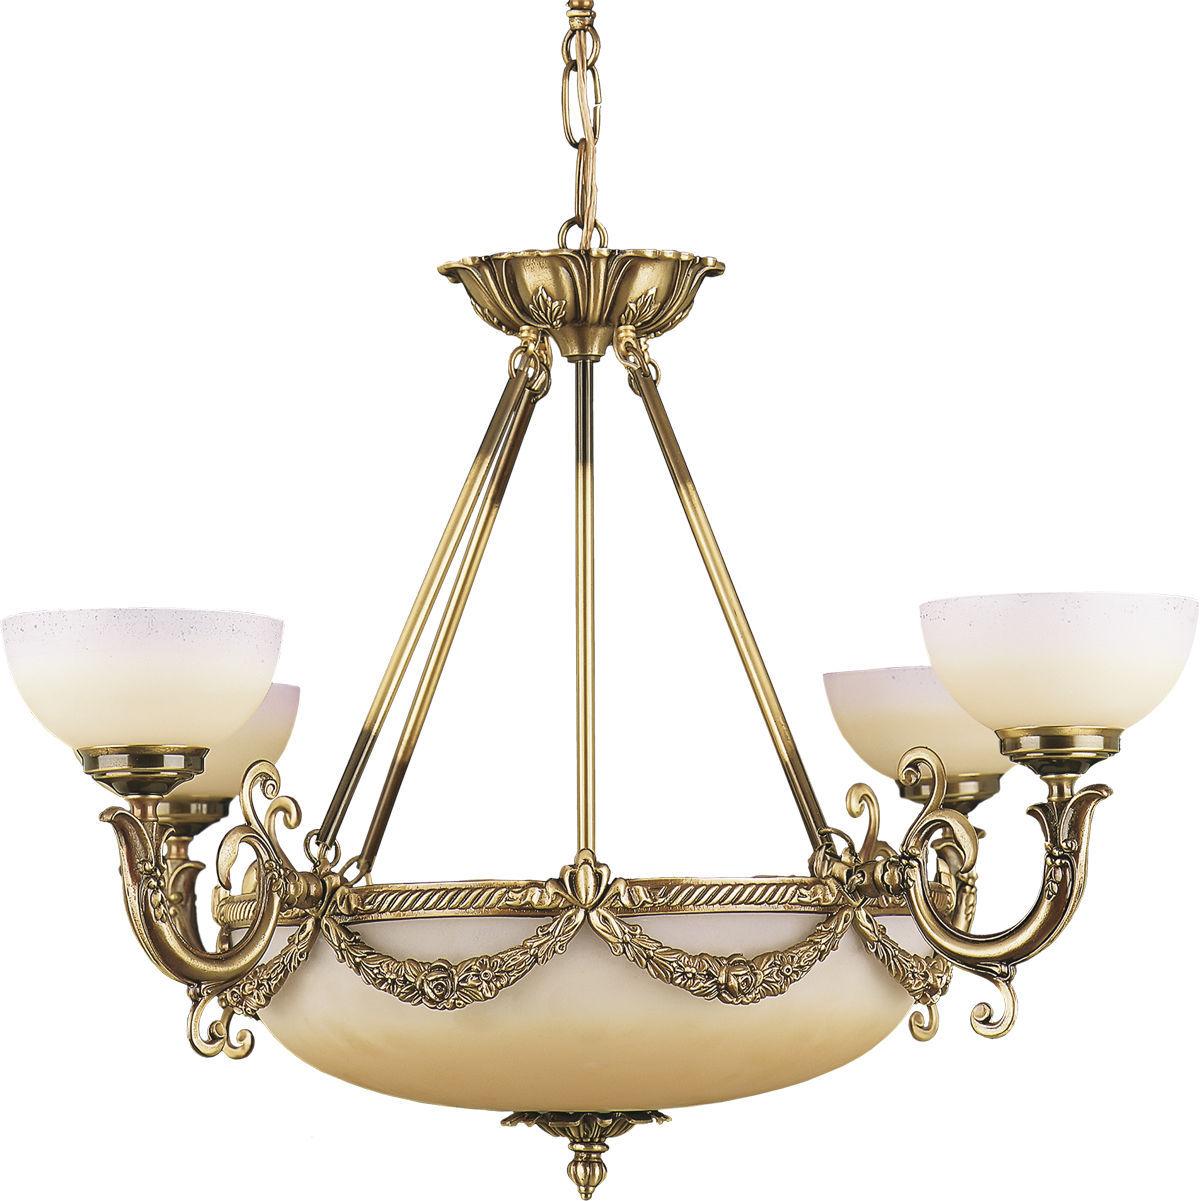 Pendant lamp classic metal dalia 217a riperlamp iluminacion pendant lamp classic metal dalia 217a aloadofball Images